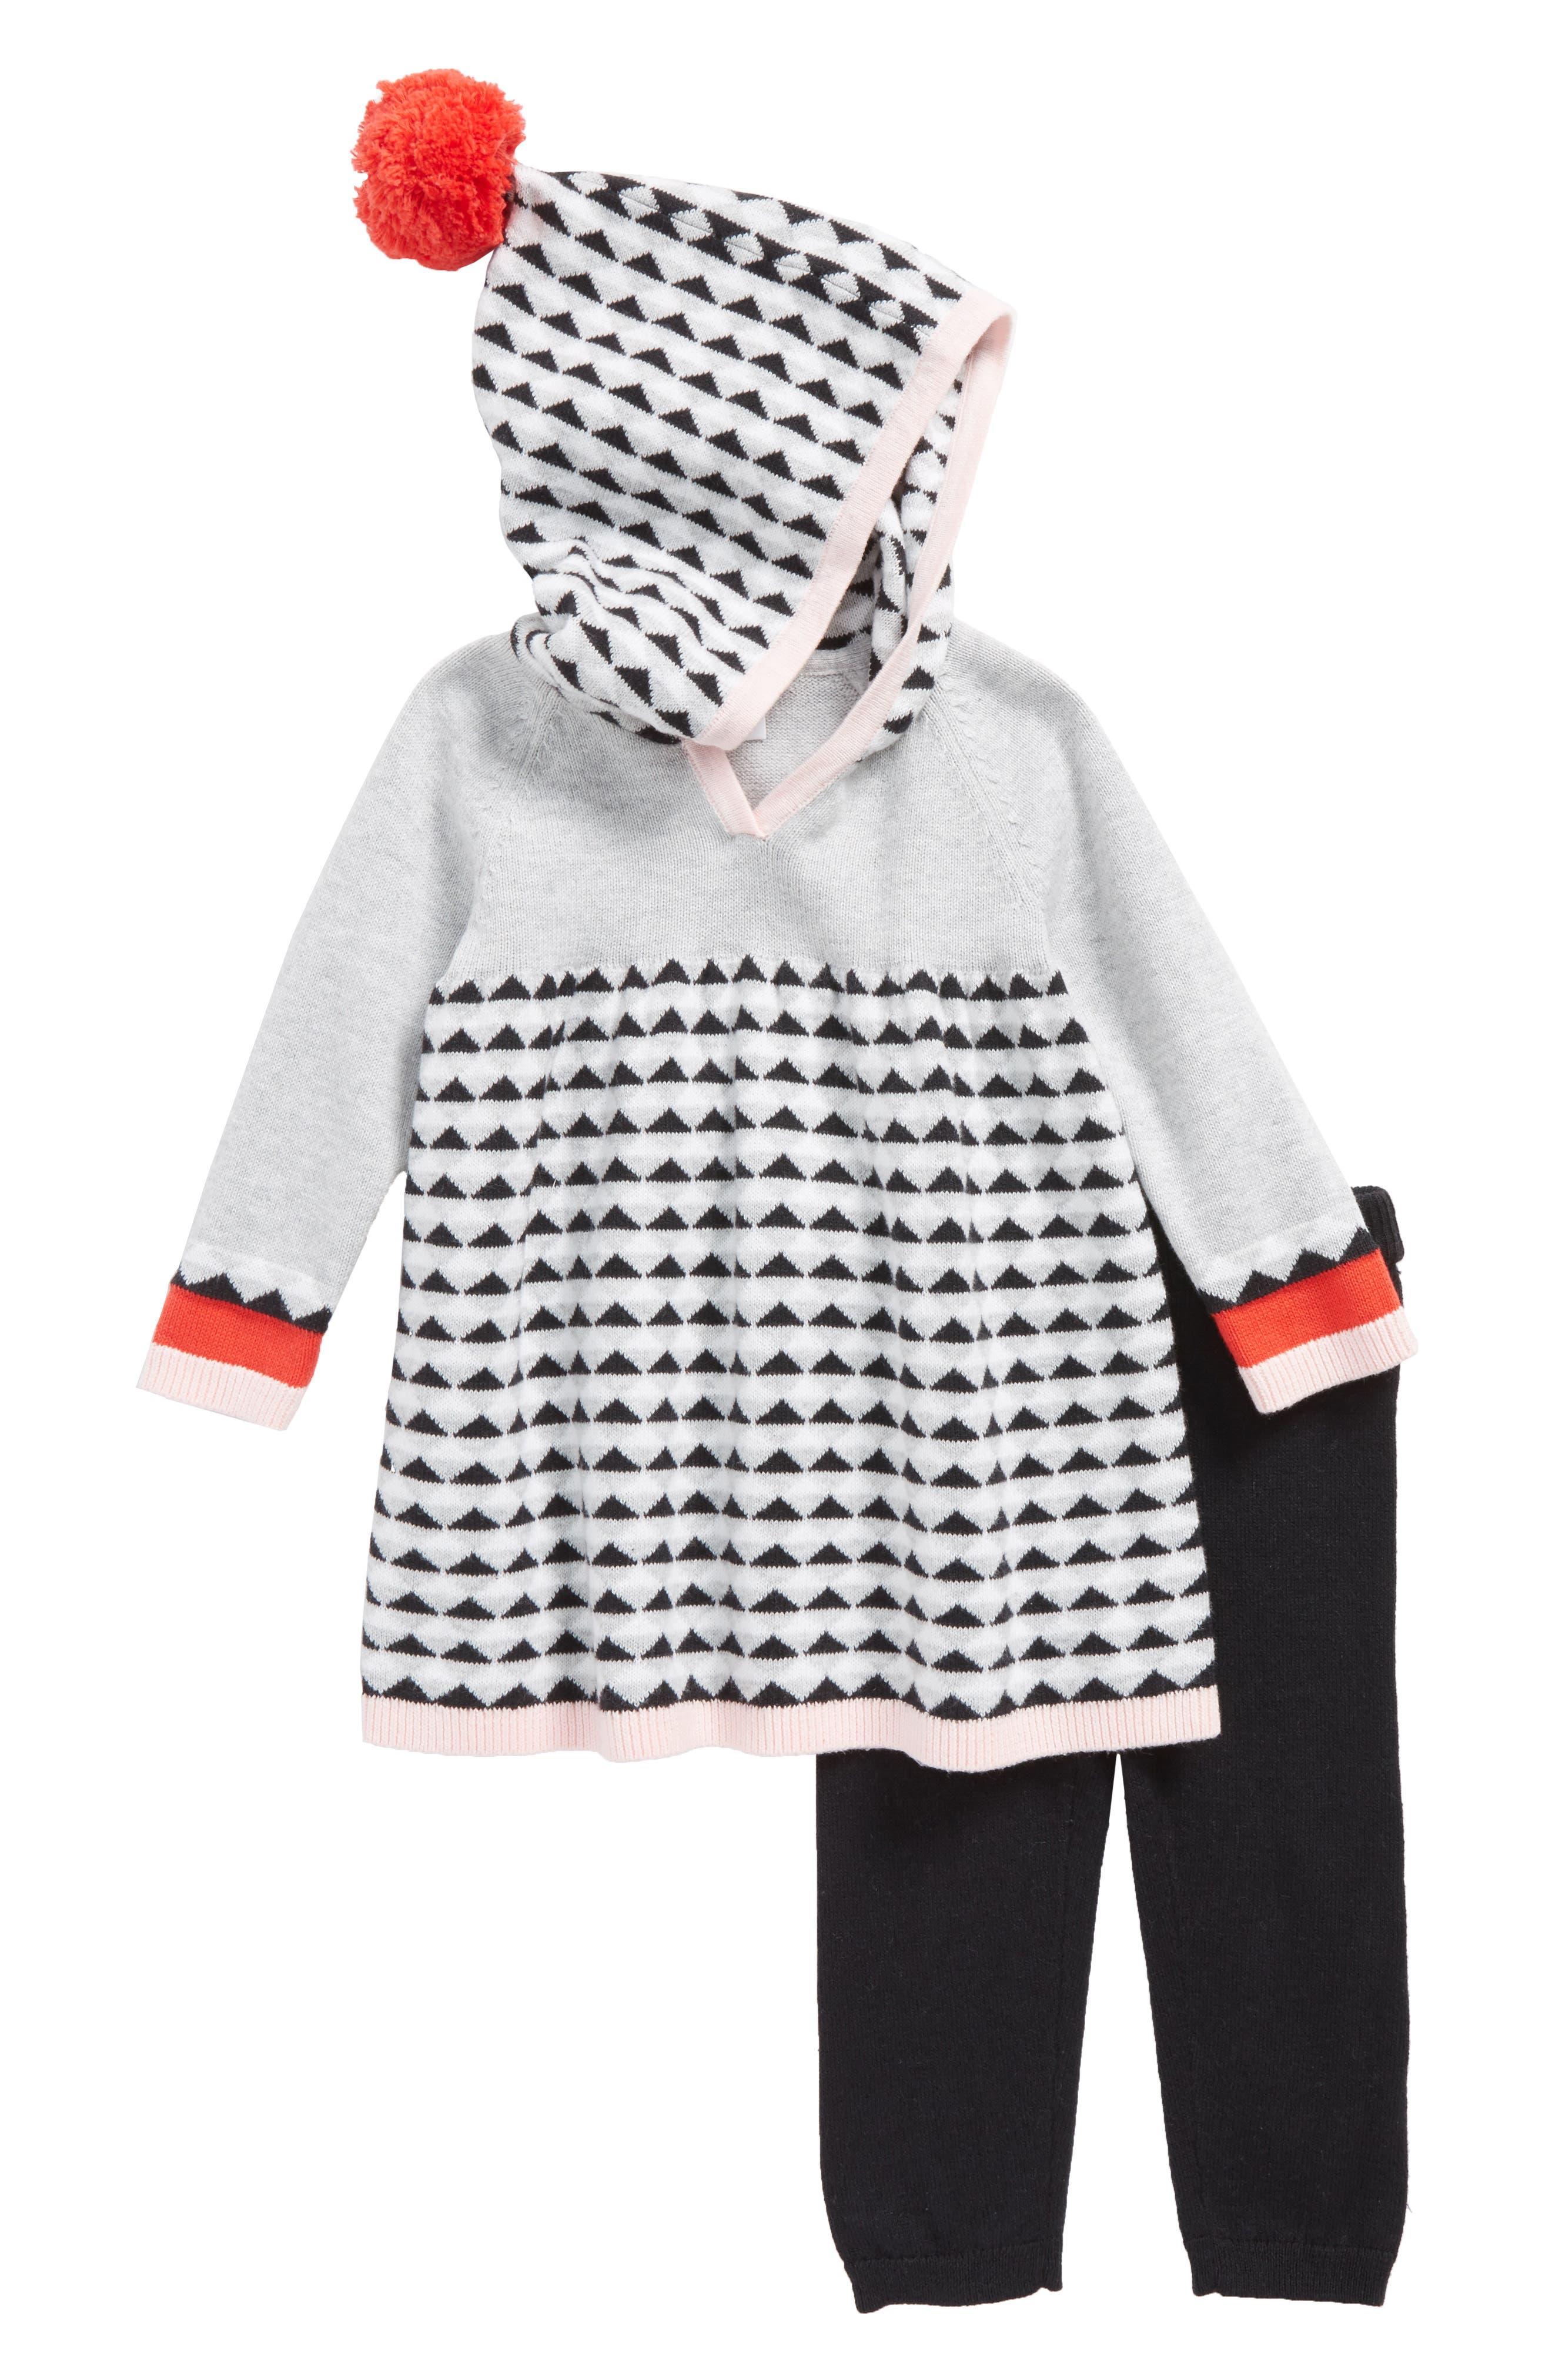 Hooded Sweater Dress & Leggings Set,                             Main thumbnail 1, color,                             050